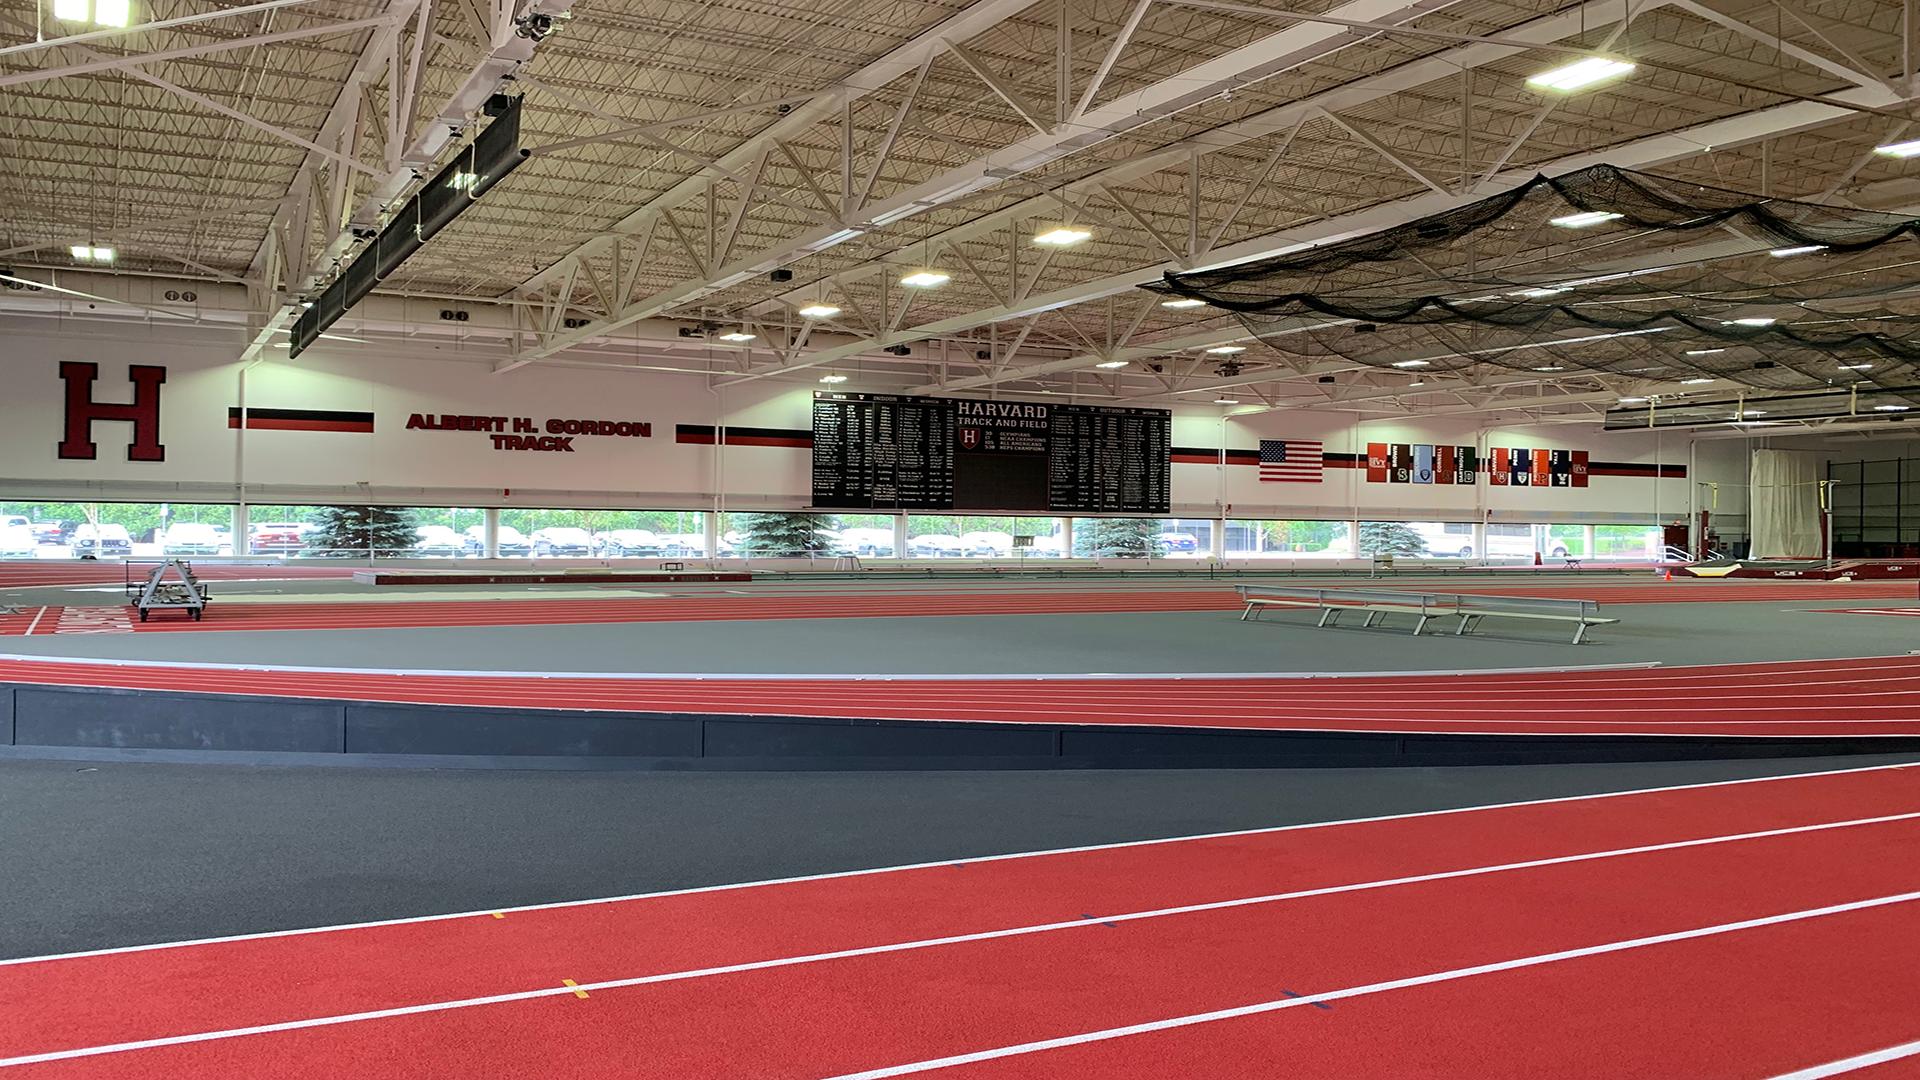 Gordon Indoor Track